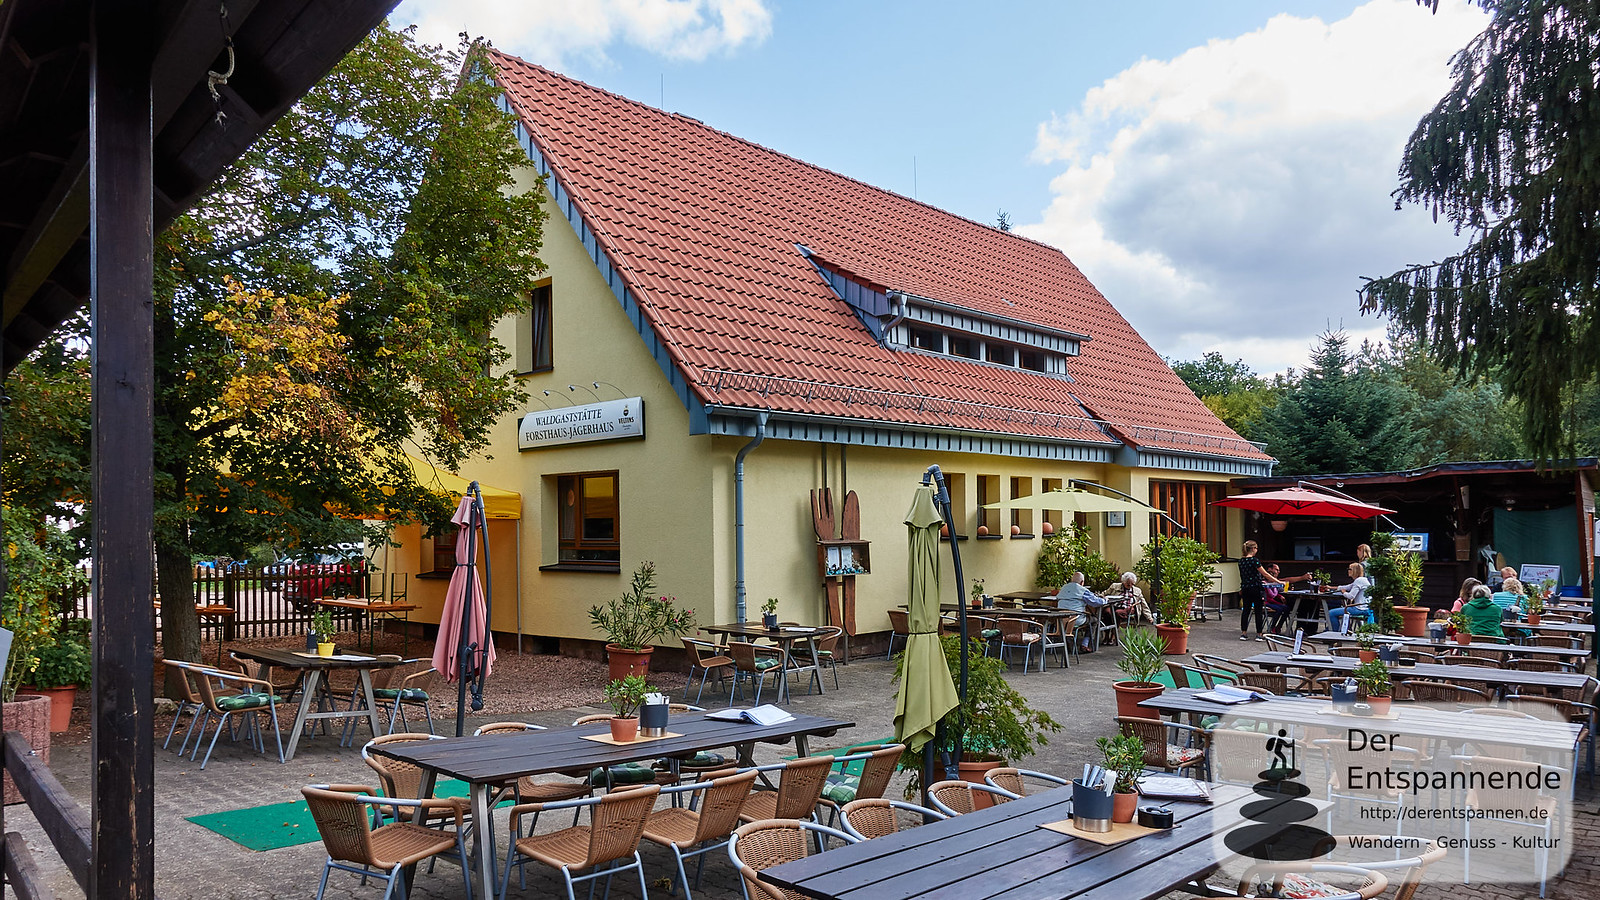 Forsthaus Jägerhaus im Binger Wald